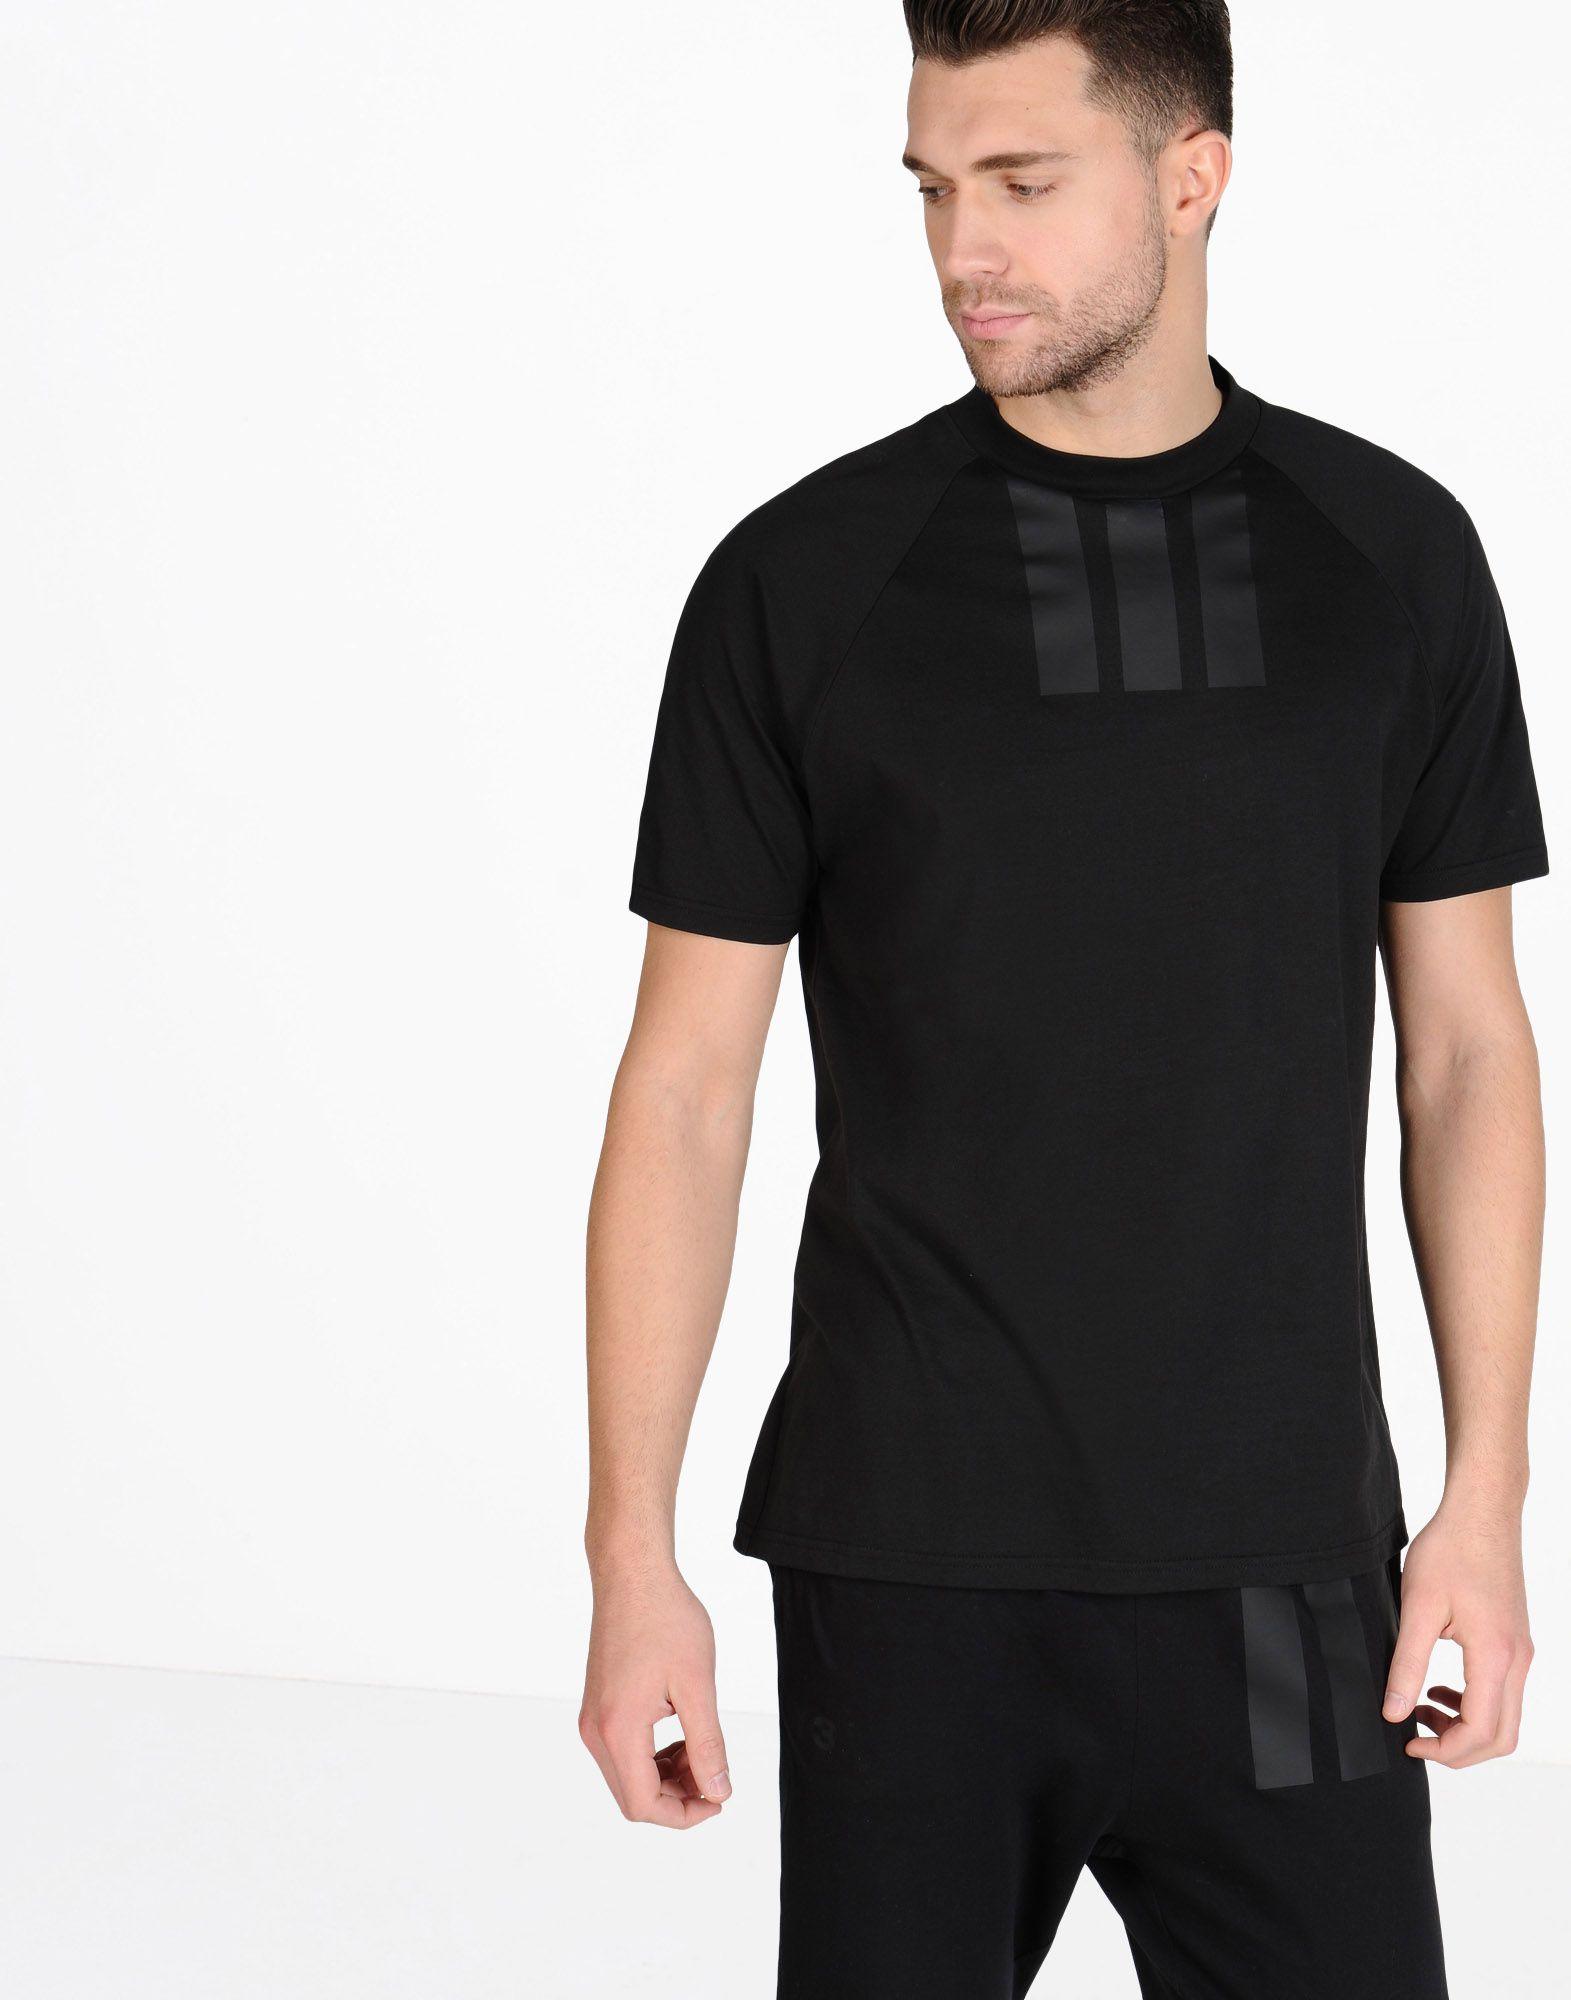 3 stripe t shirt